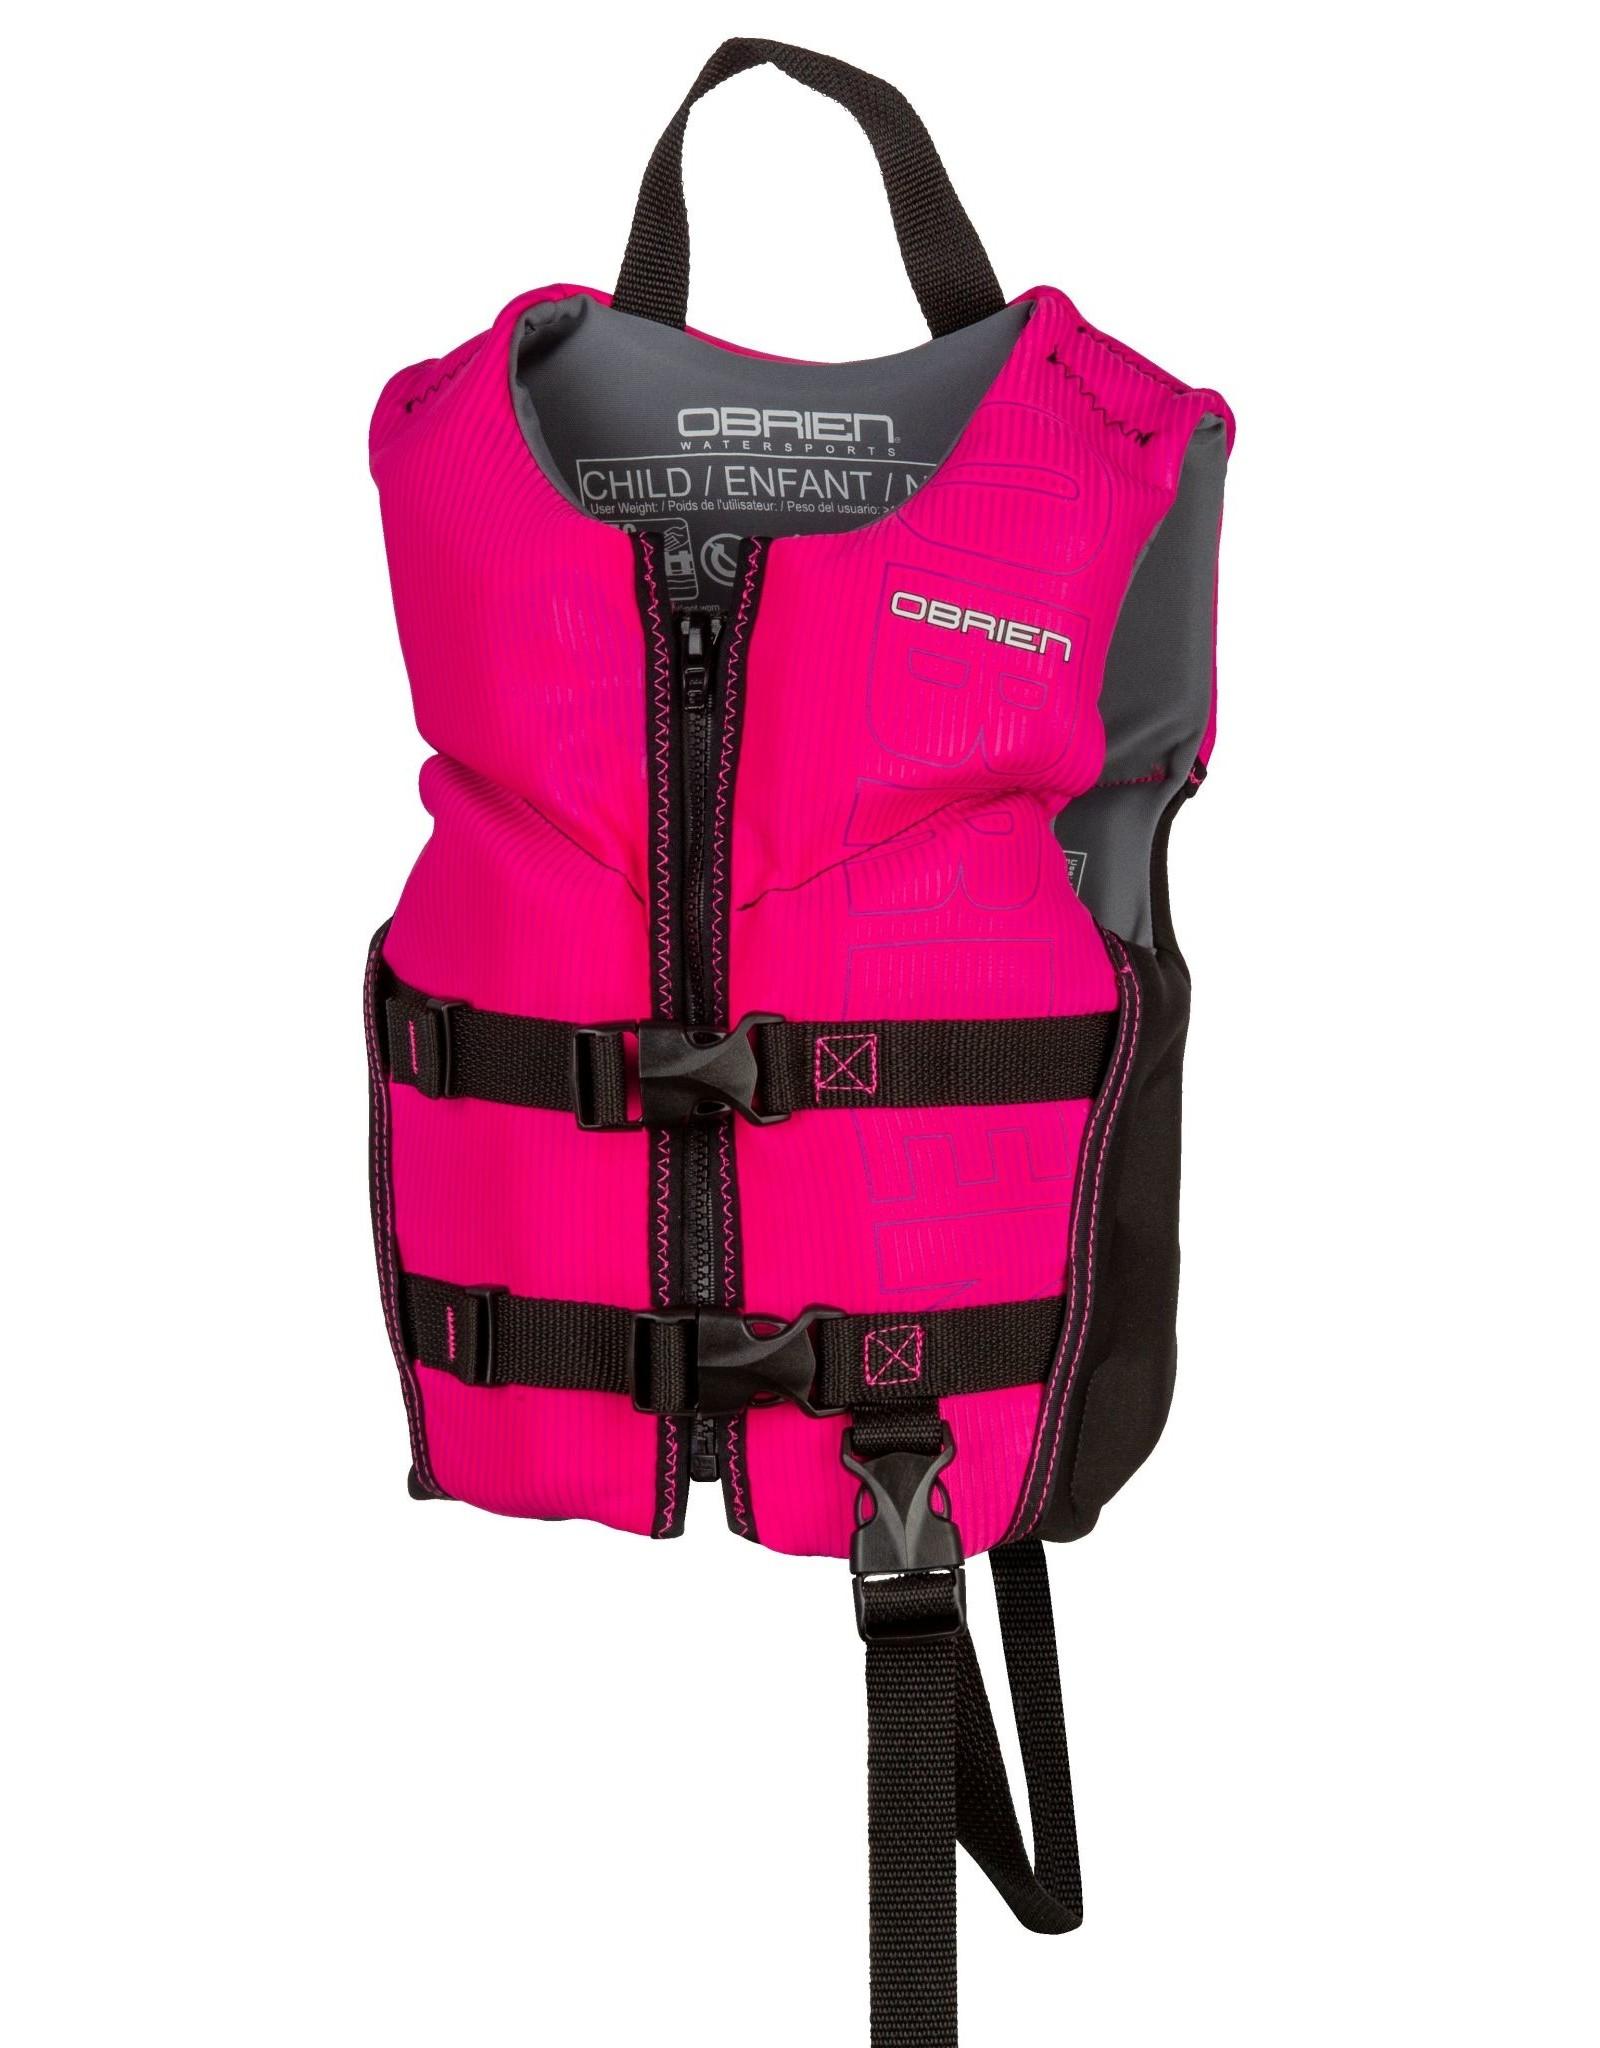 O'Brien Child Flex V-Back Blk/Pink (33-55 lbs)